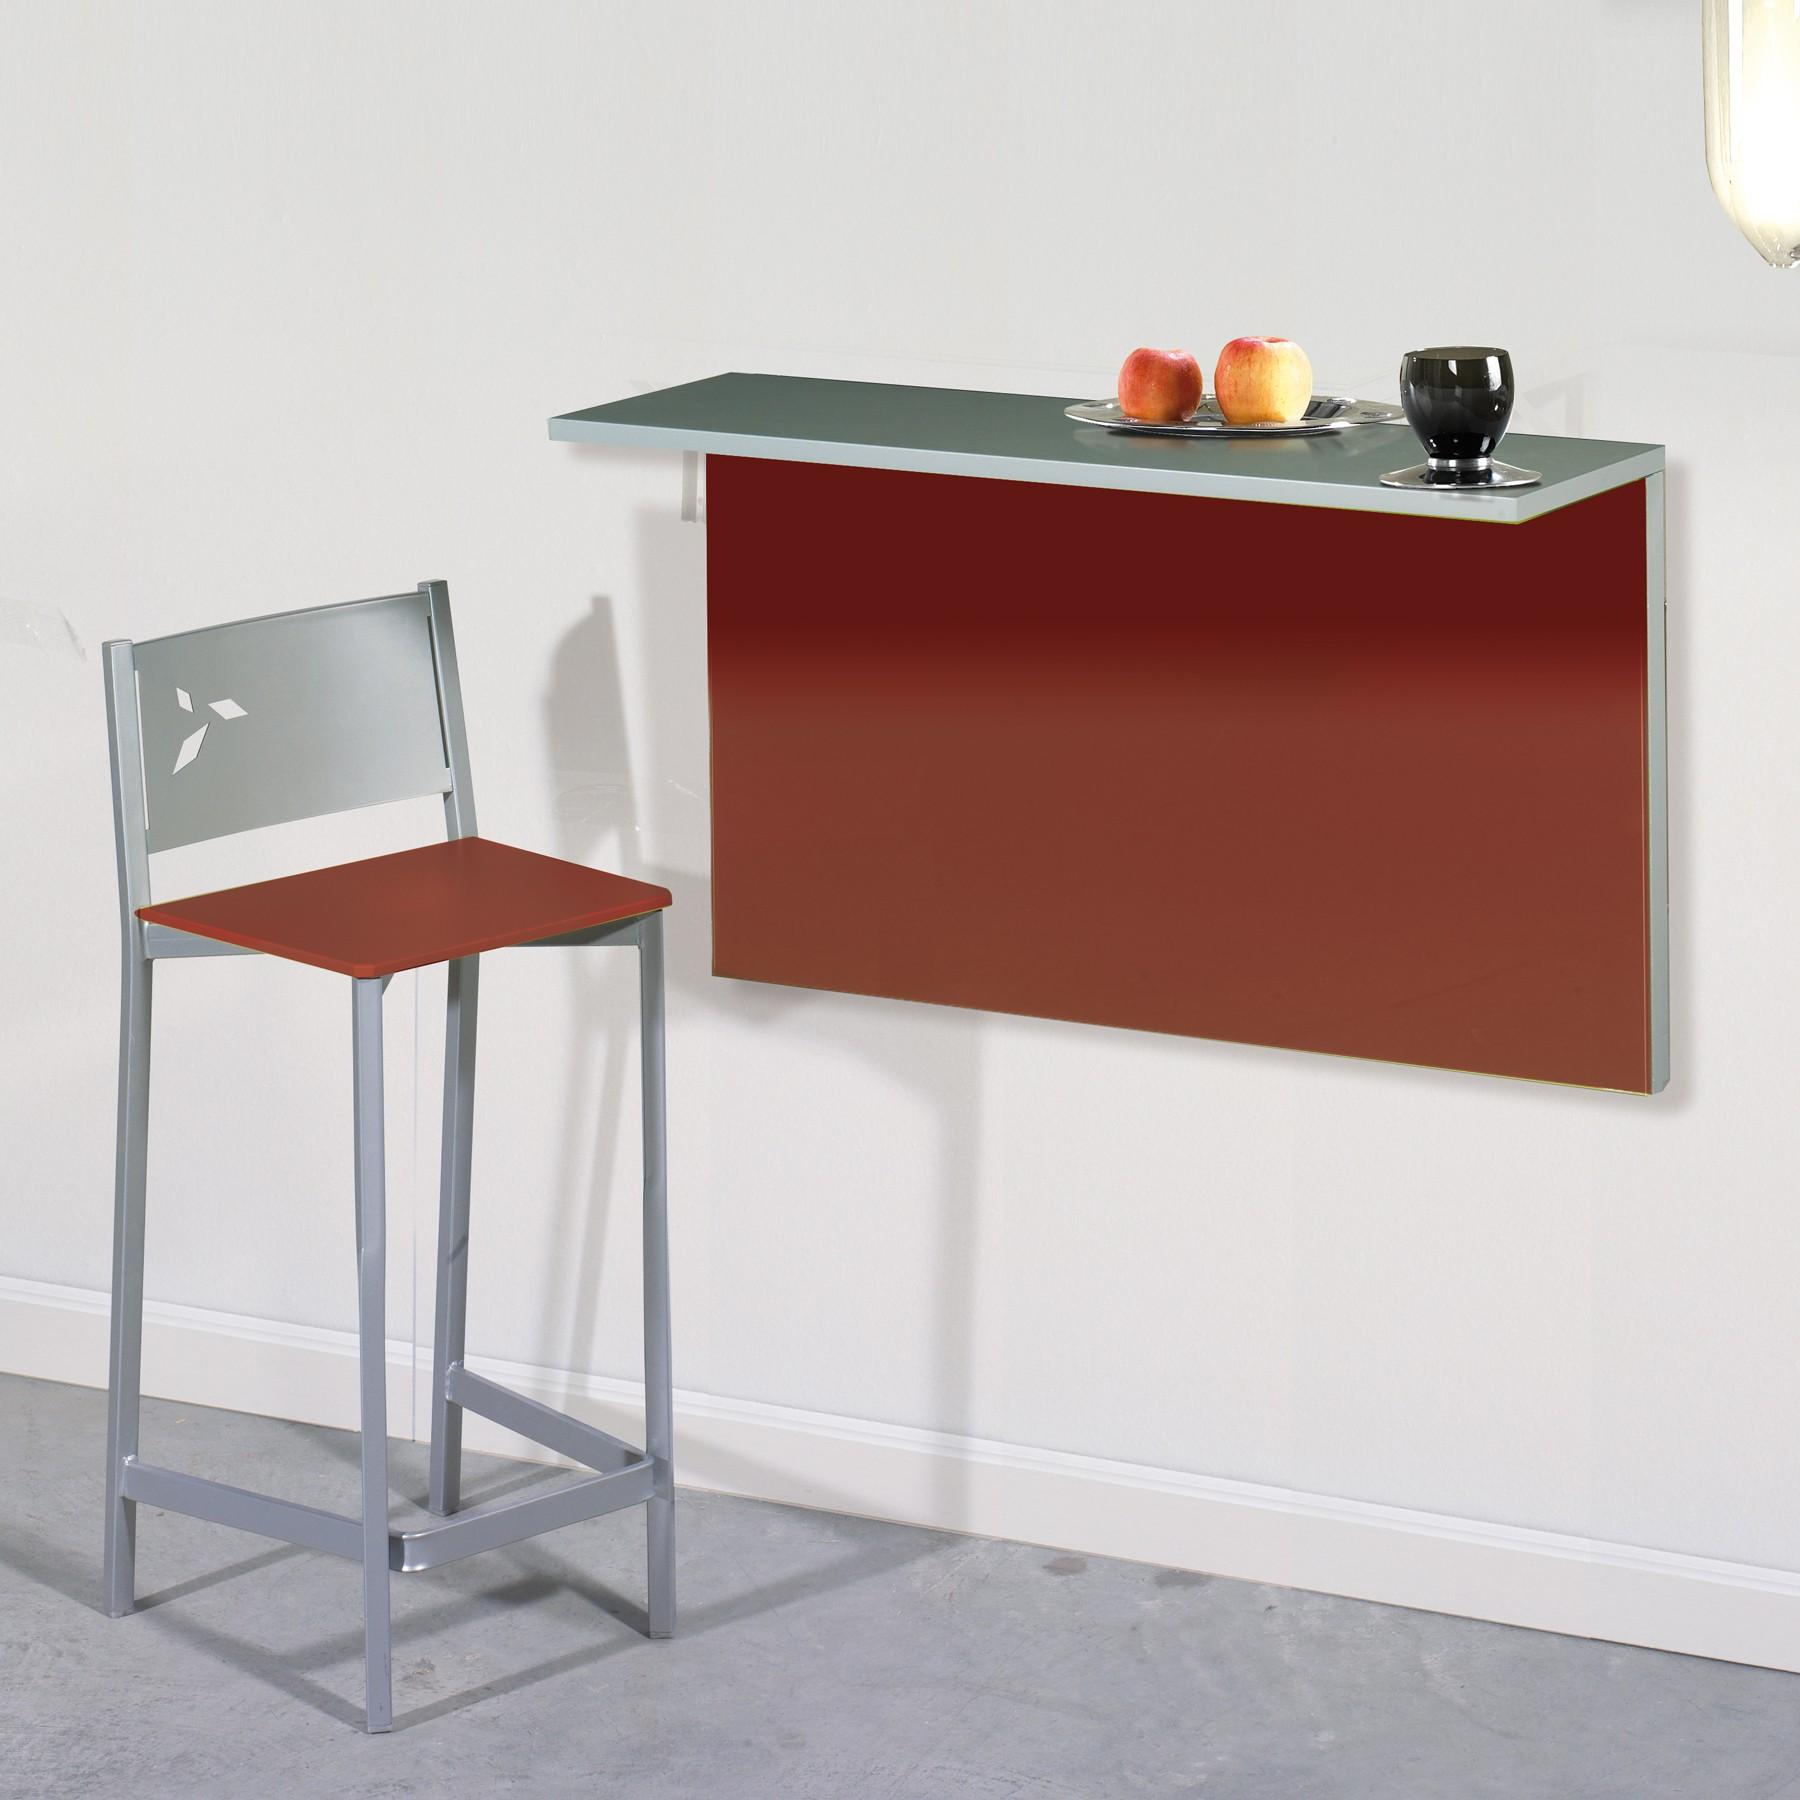 25 bonito mesas plegables para cocina fotos foto cocina - Mesas de cocina abatibles ...